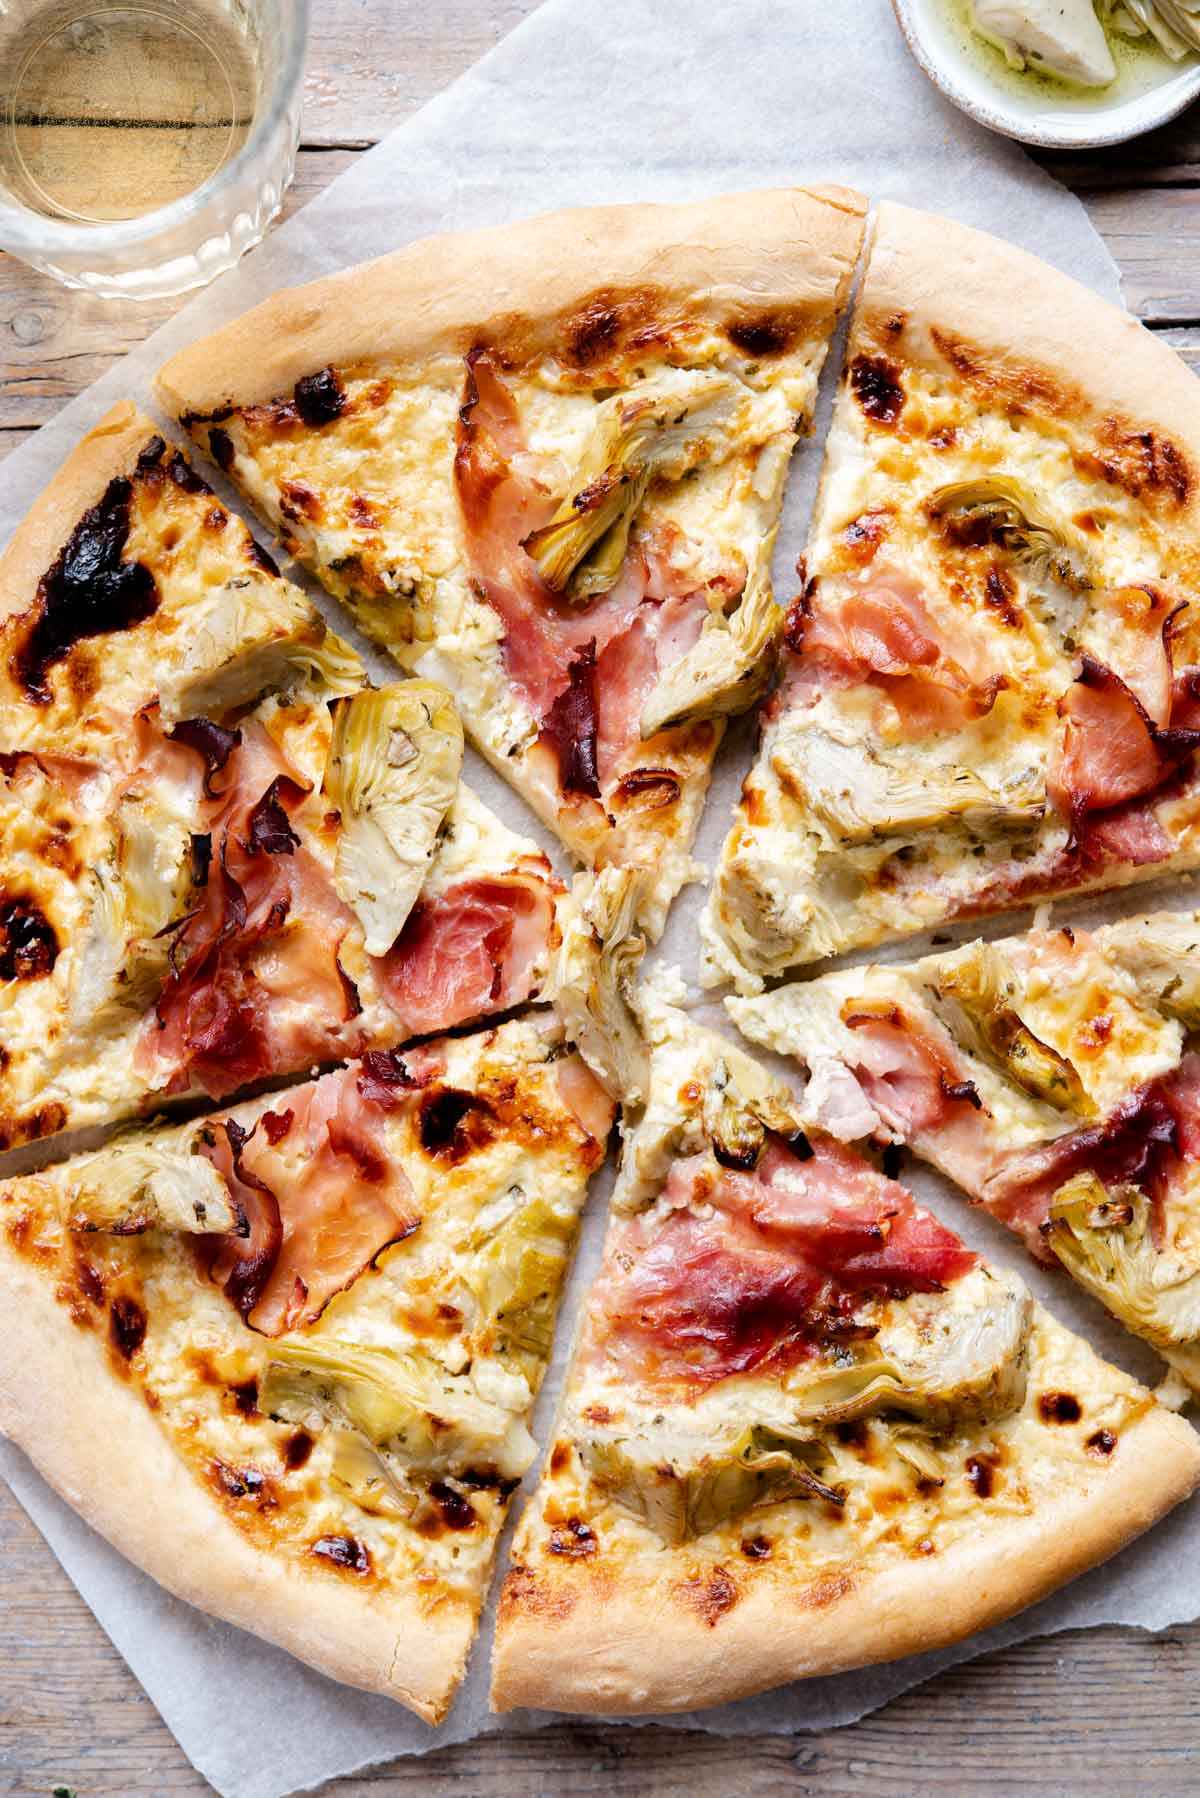 An overhead shot of an artichoke pizza cut into slices